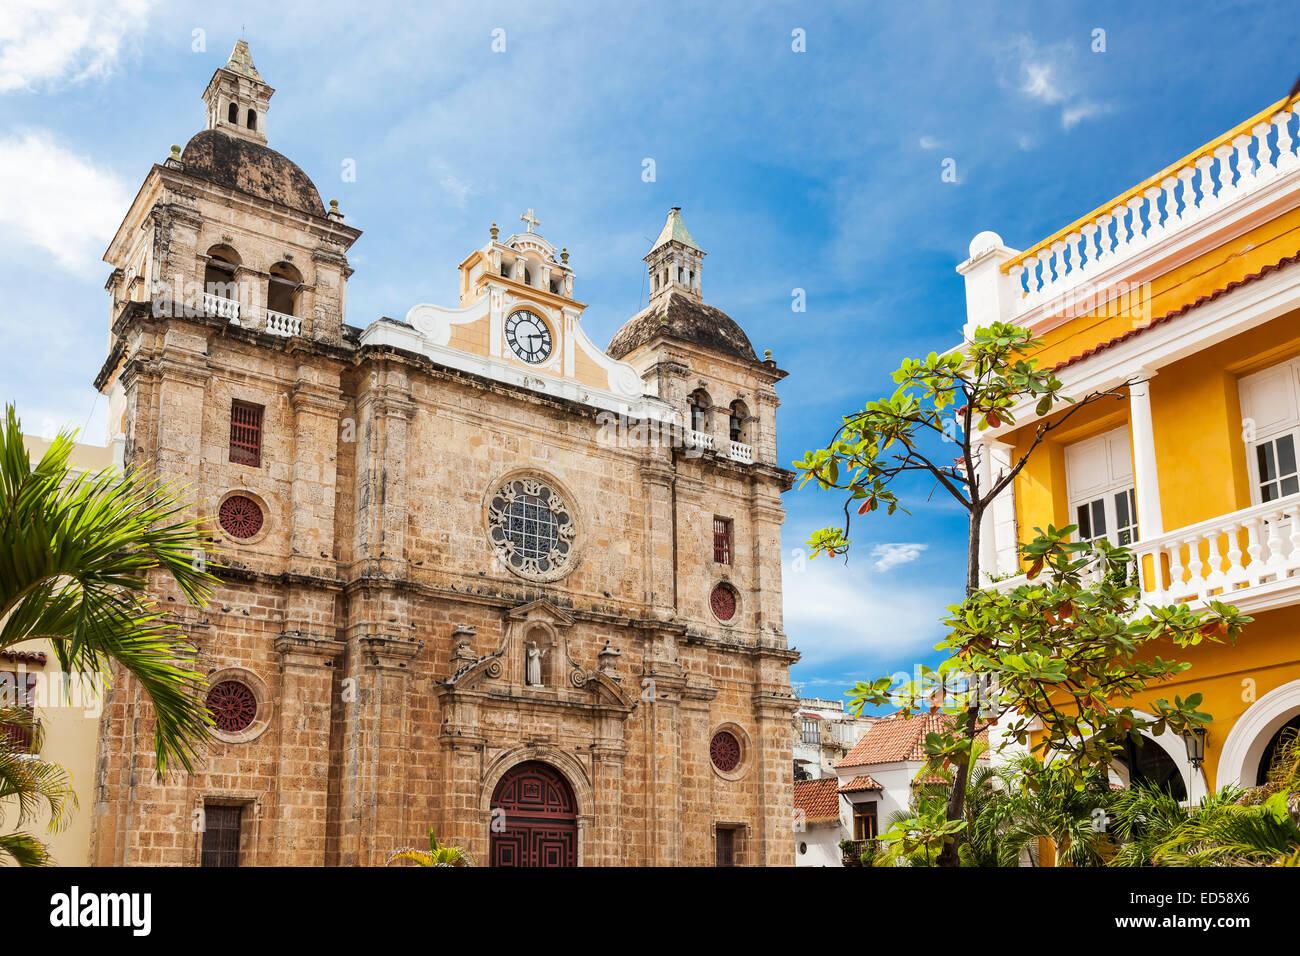 Cartagena, Colombia - Stock Image